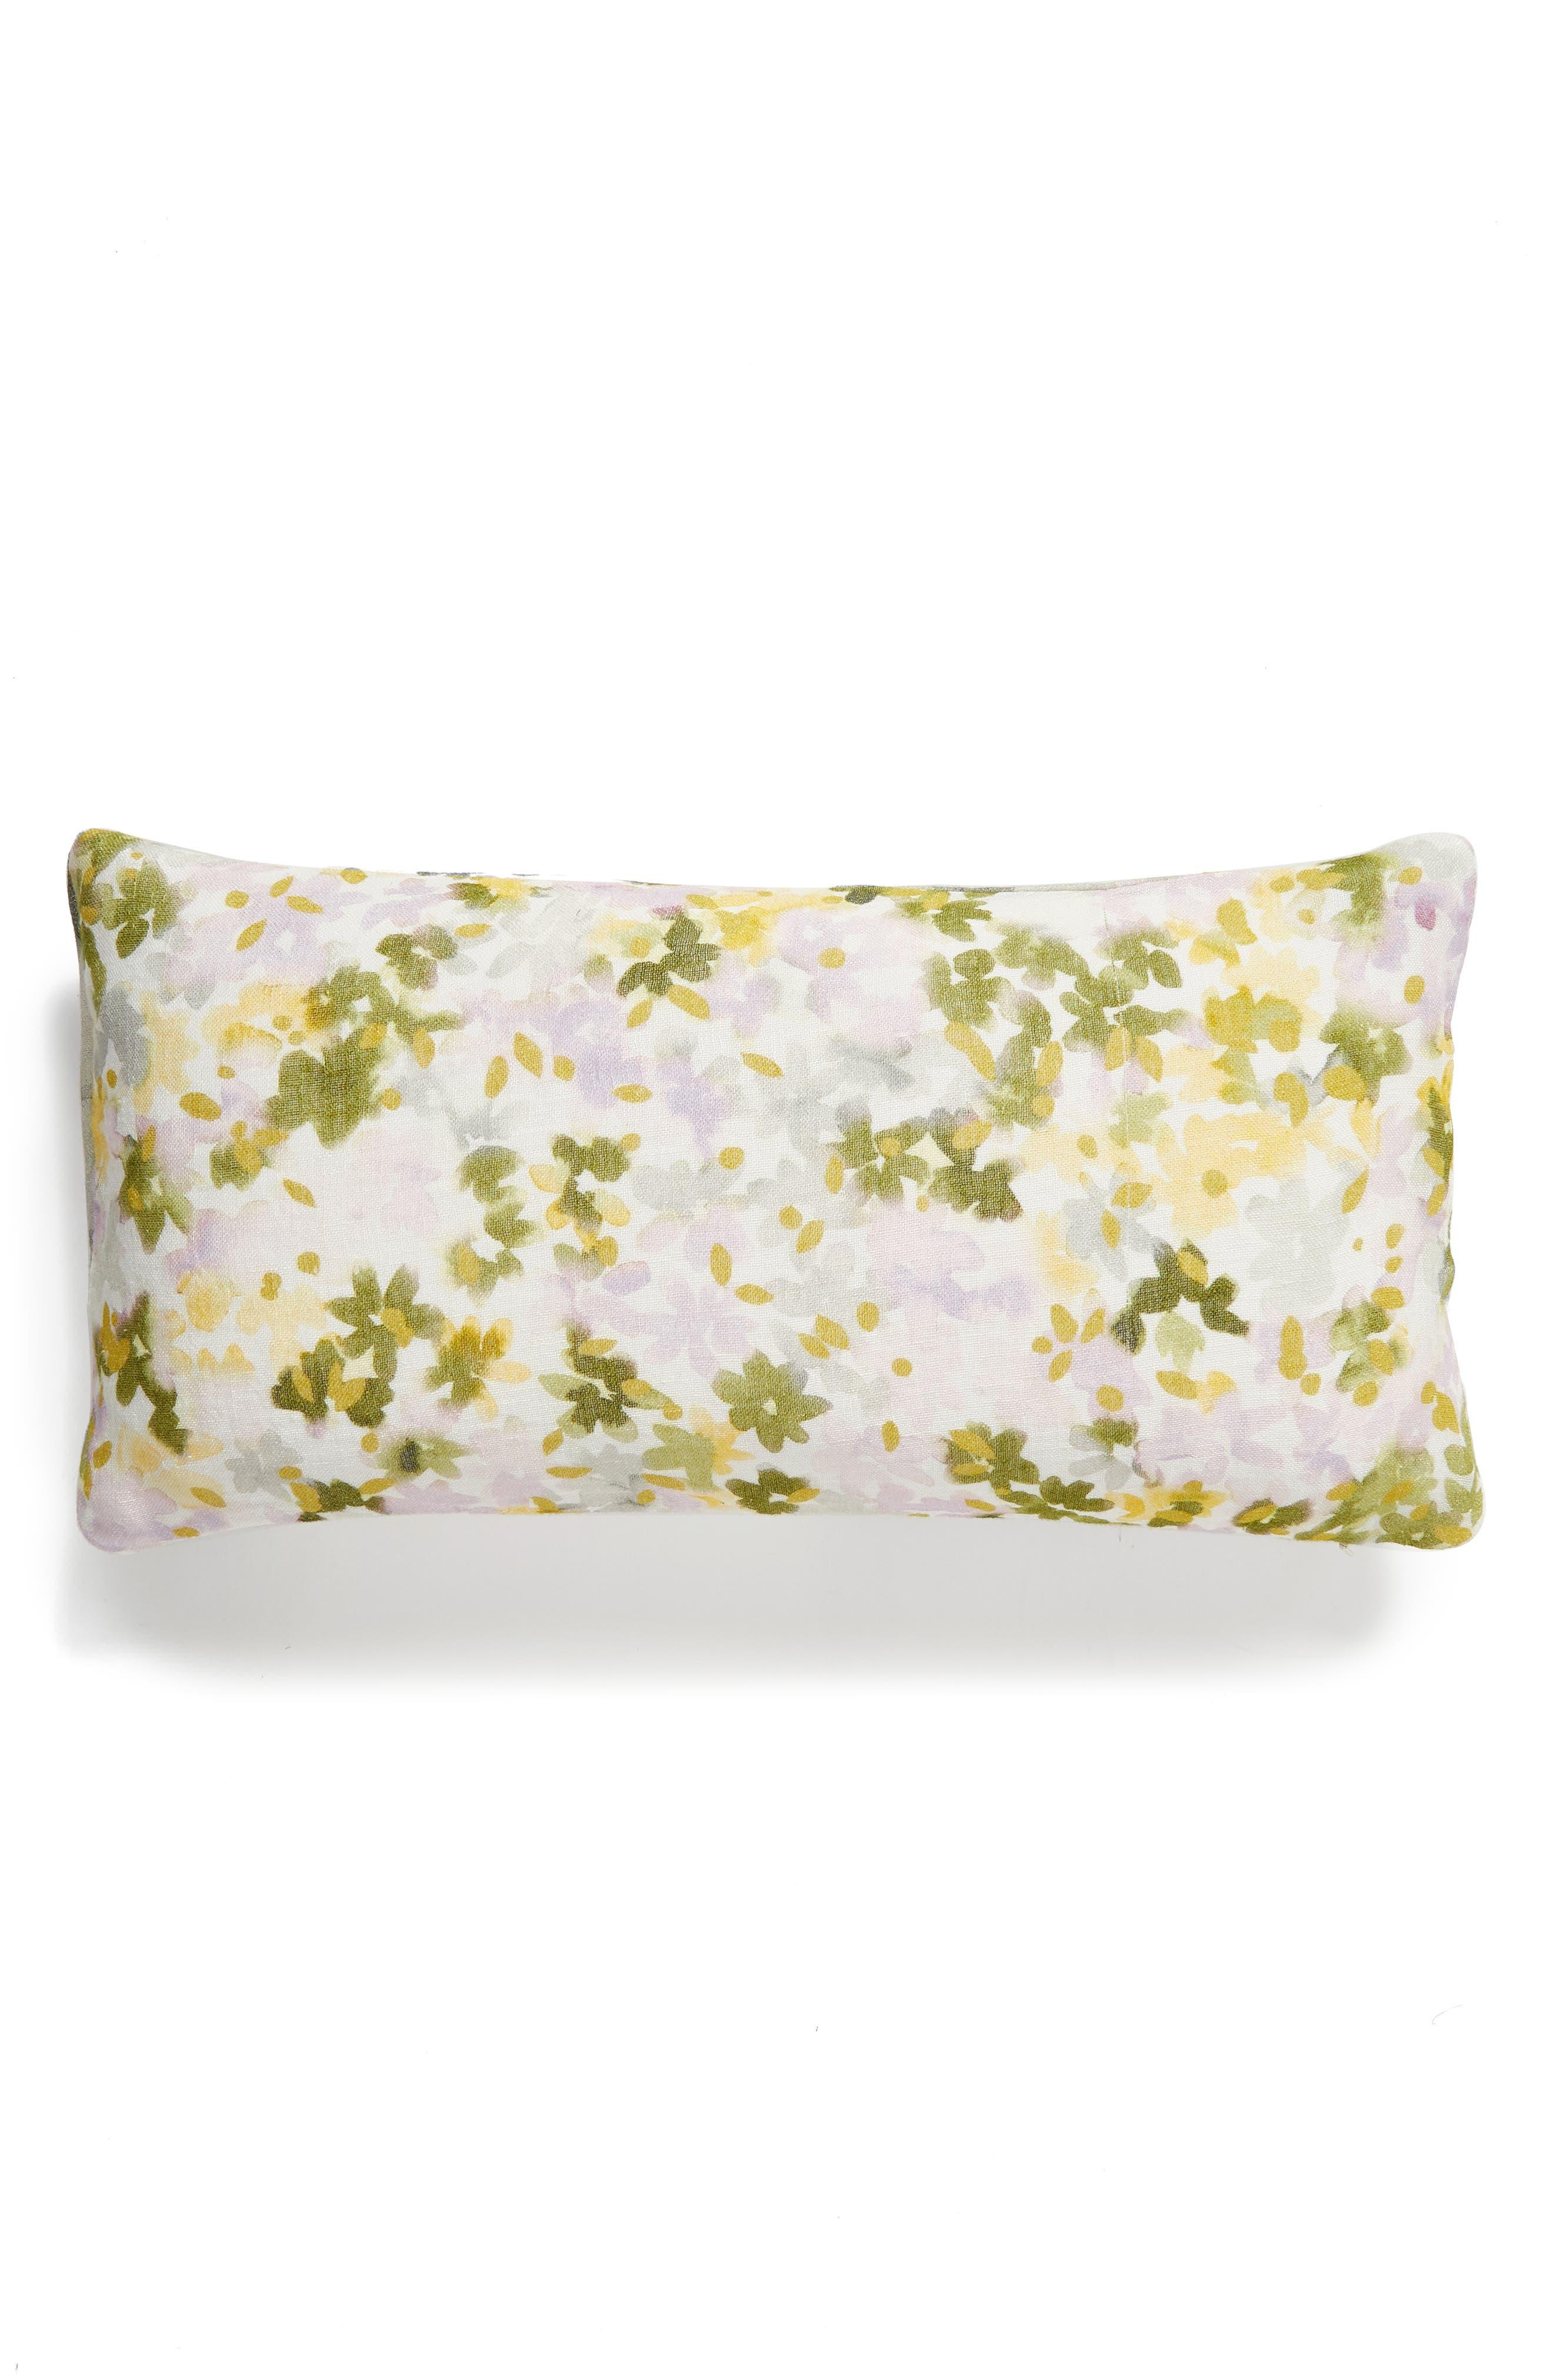 NORDSTROM AT HOME, Floral Linen Accent Pillow, Alternate thumbnail 2, color, GREY VAPOR MULTI